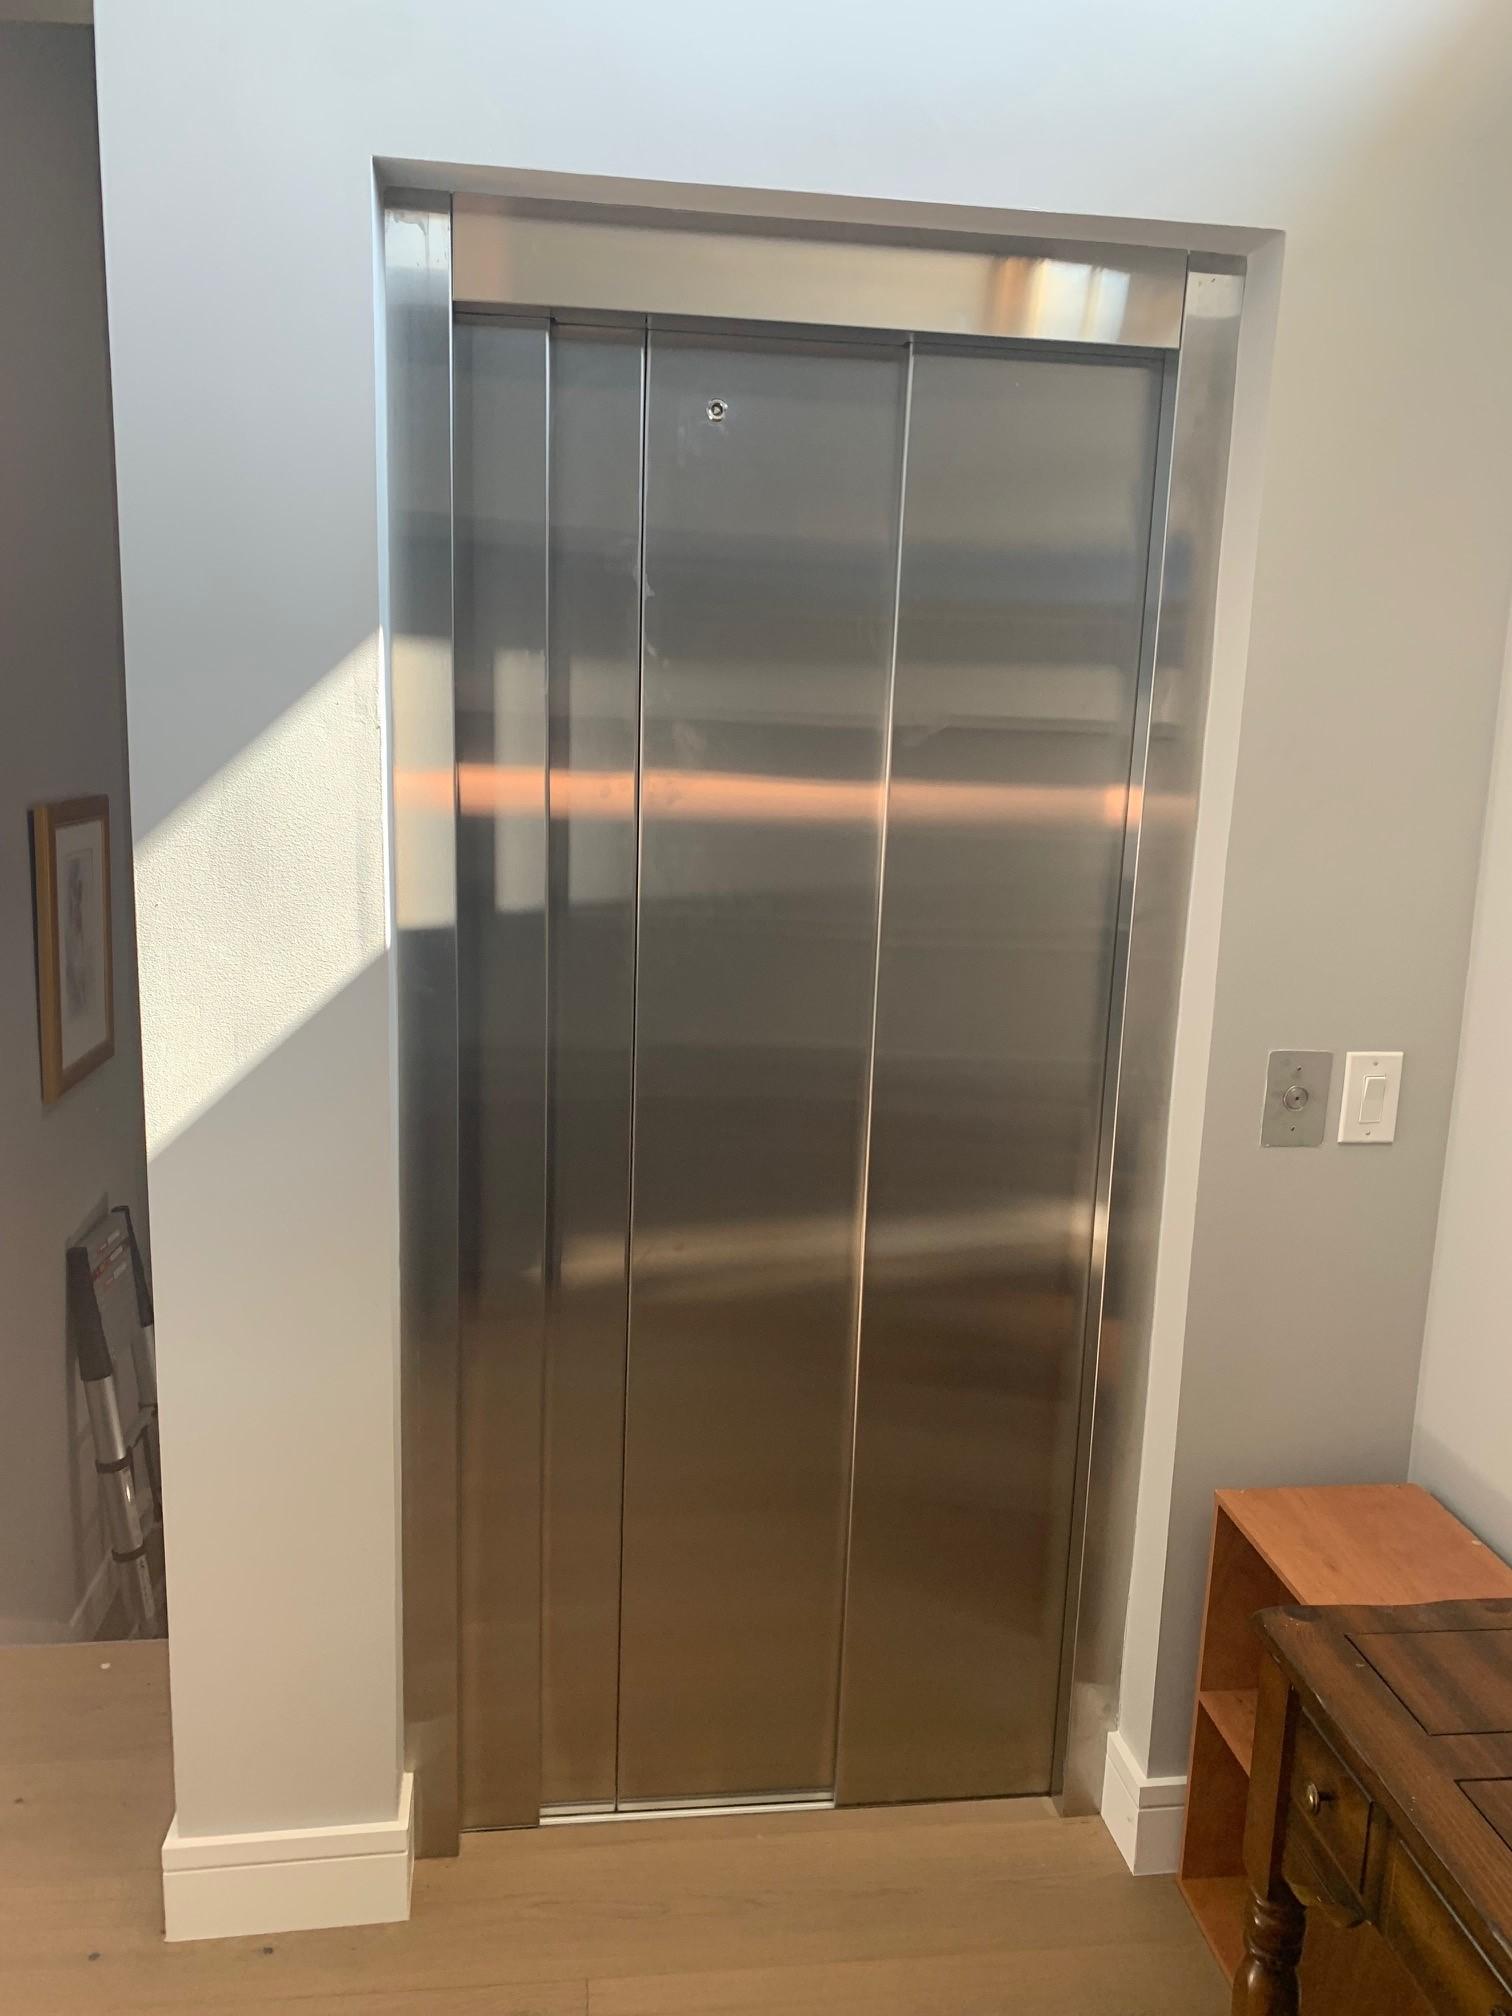 Savaria Eclipse with Stainless Steel Slim-Line Doors